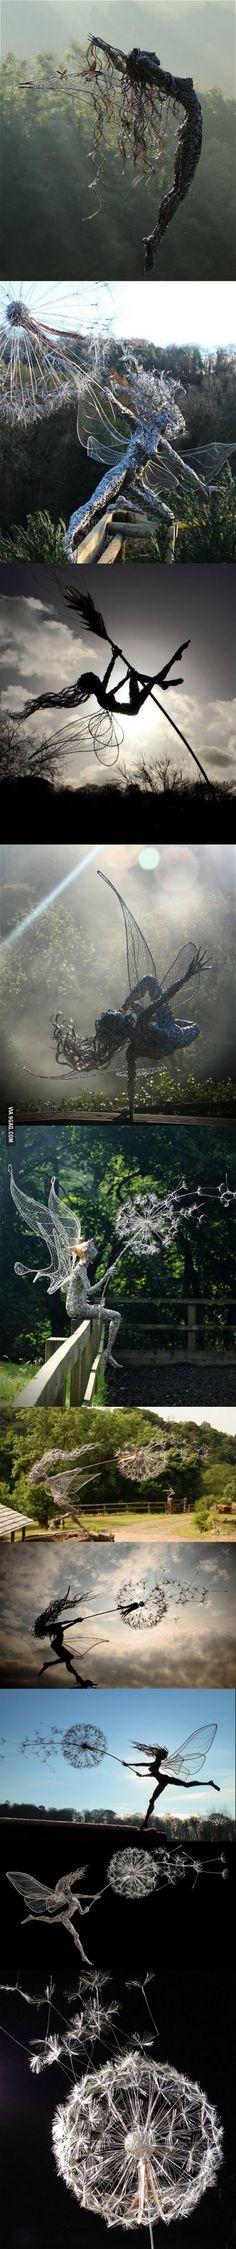 Fantasy fairies wire sculptures @australia91: